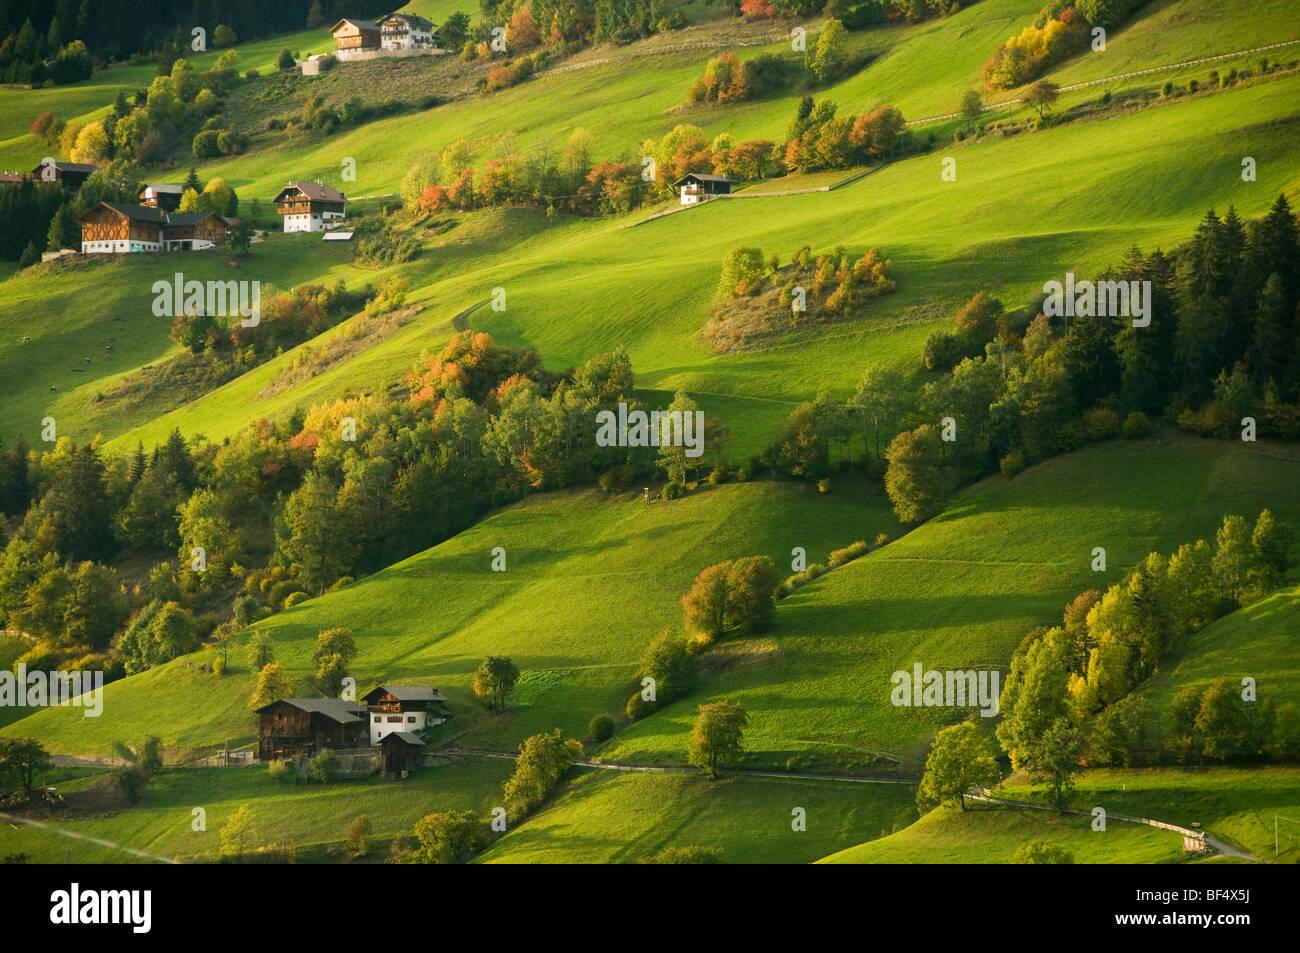 Maisons et fermes, Val di Funes, Dolomites, Trentino-Alto Adige, Italie Photo Stock